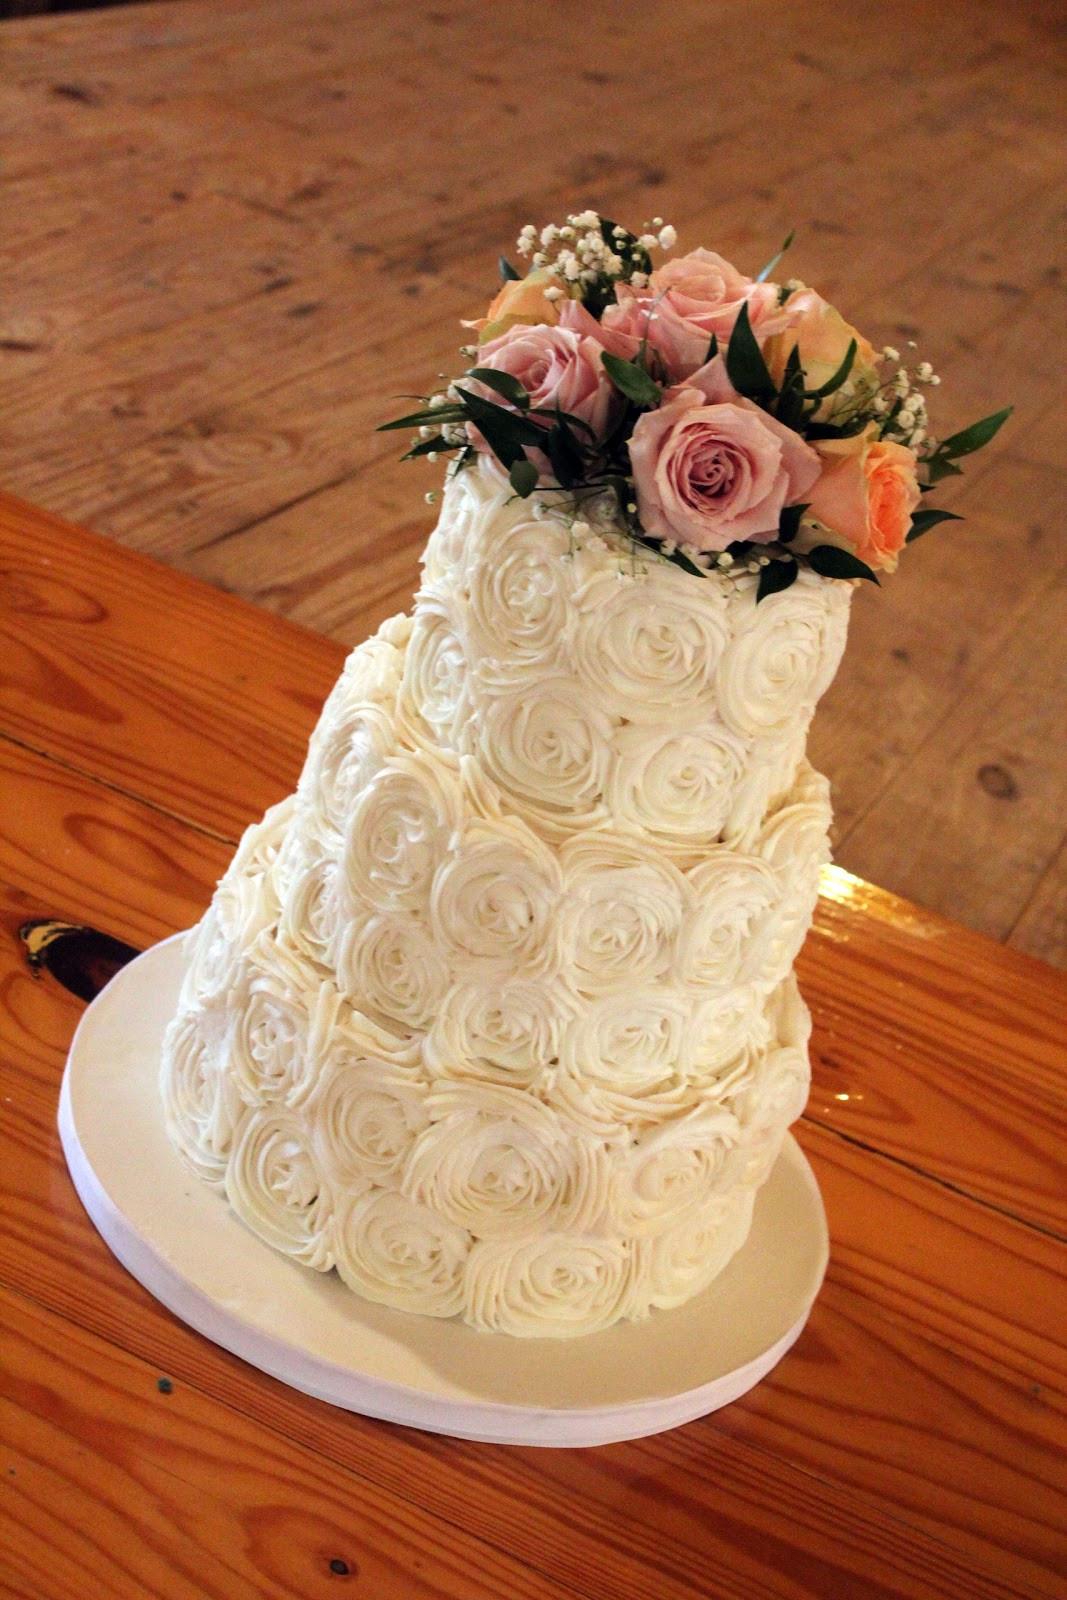 Rustic Chic Wedding Cakes  Sweet Stirrings Rustic Chic Wedding